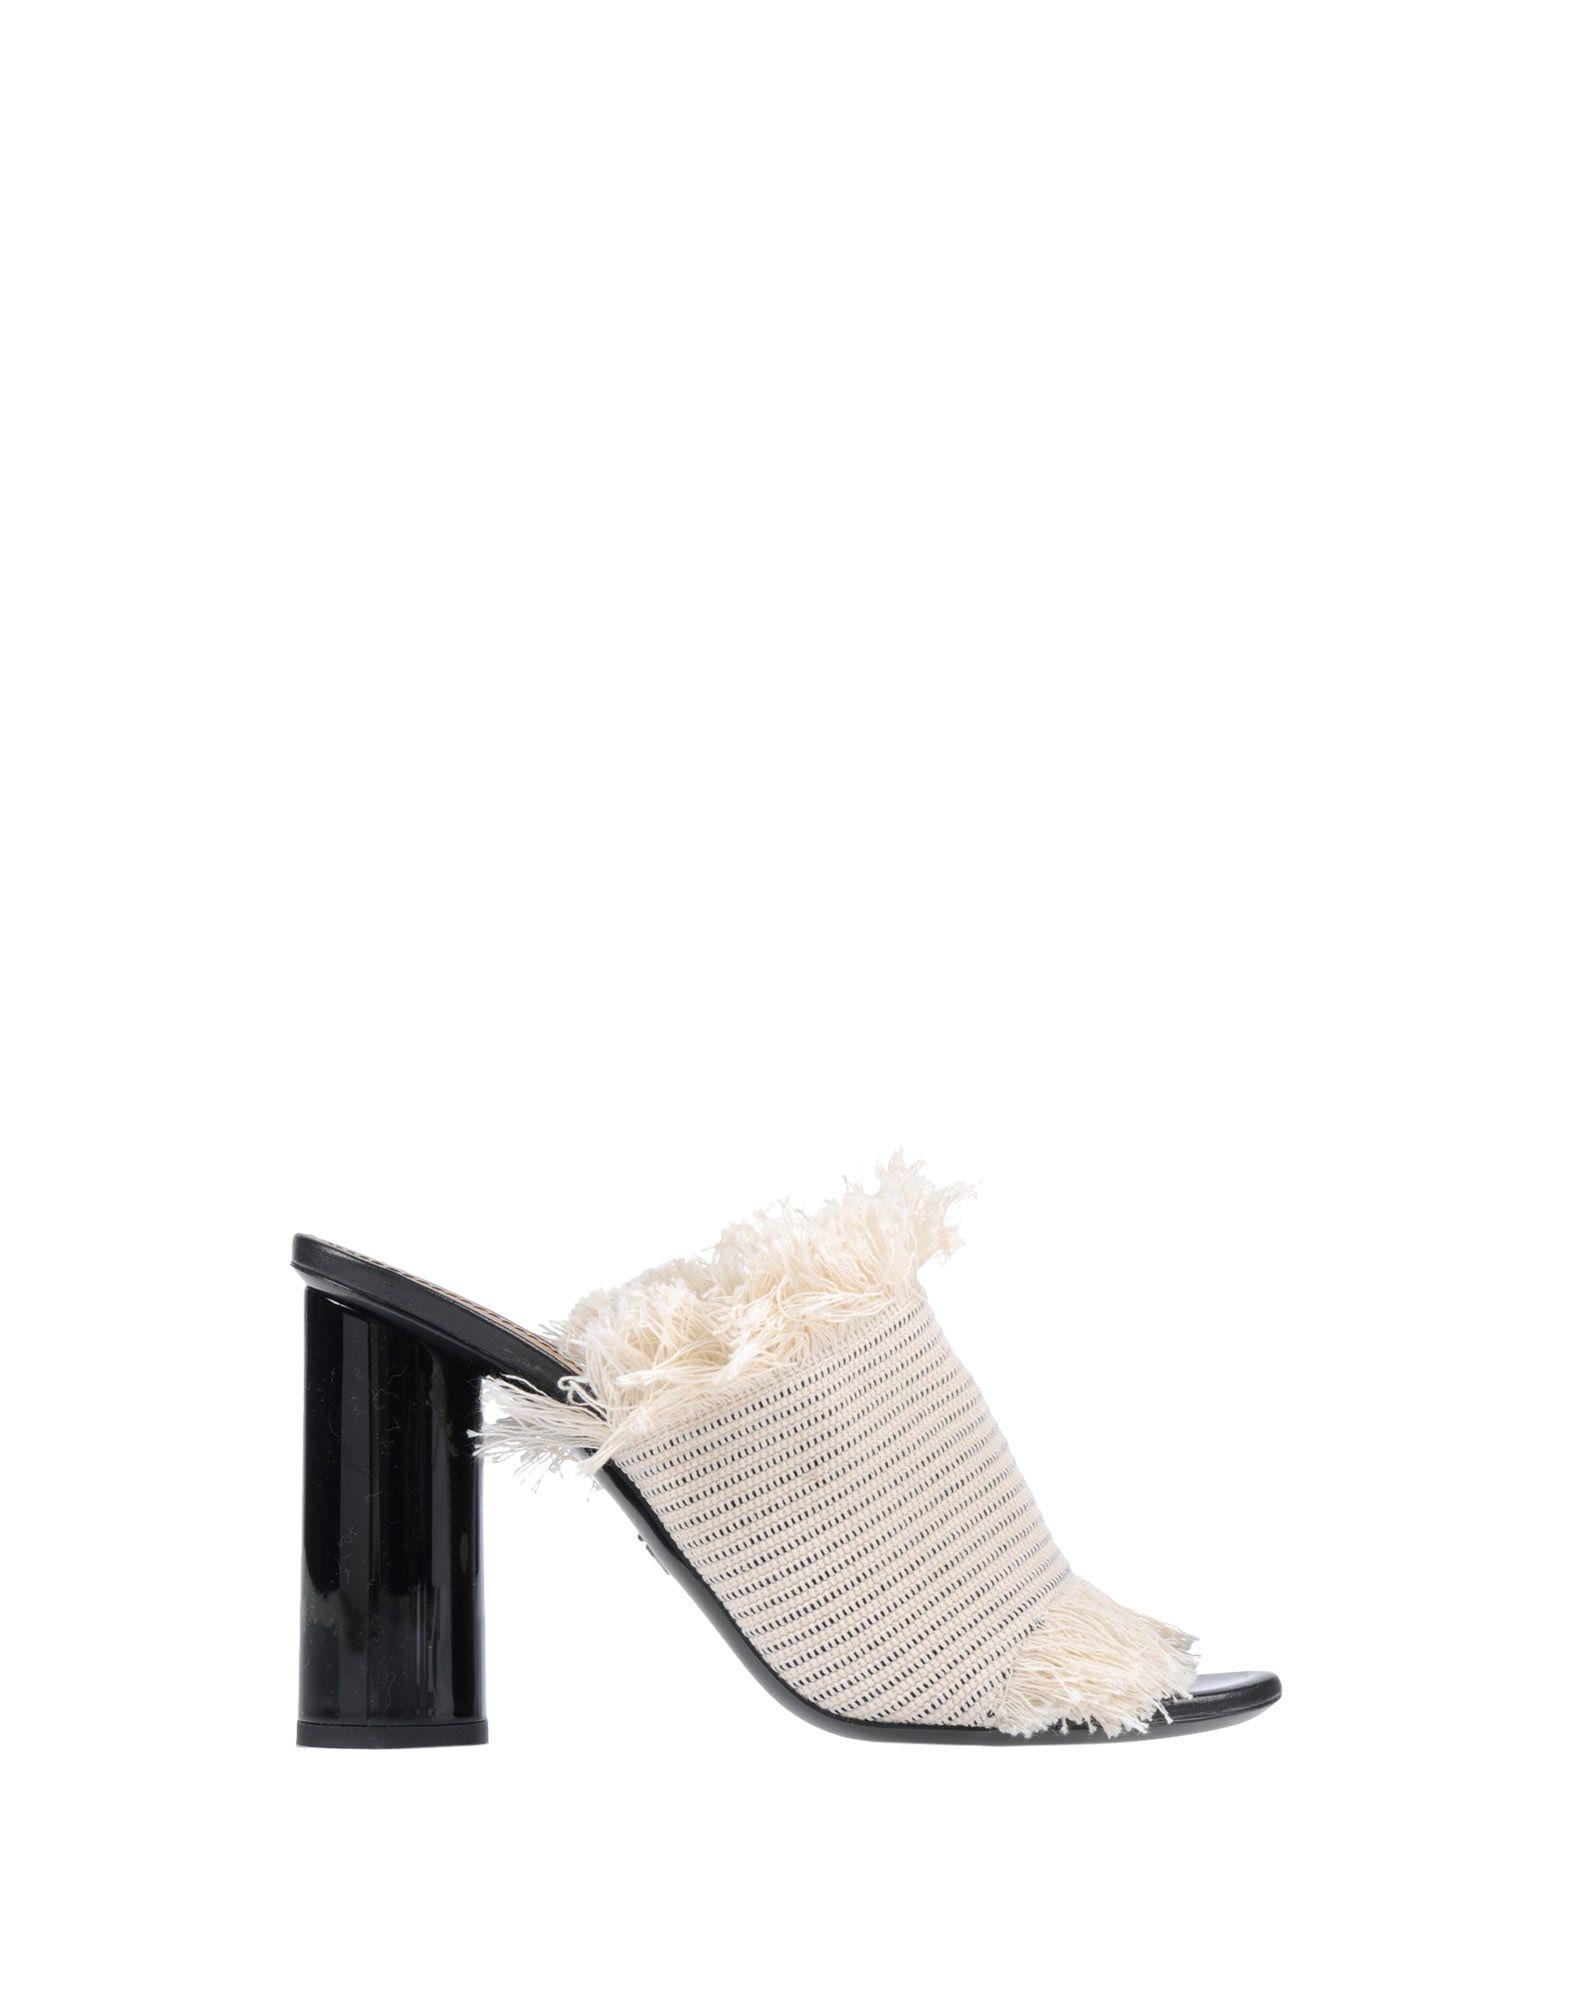 Proenza Schouler Sandalen Damen  11475566UOGut aussehende strapazierfähige Schuhe